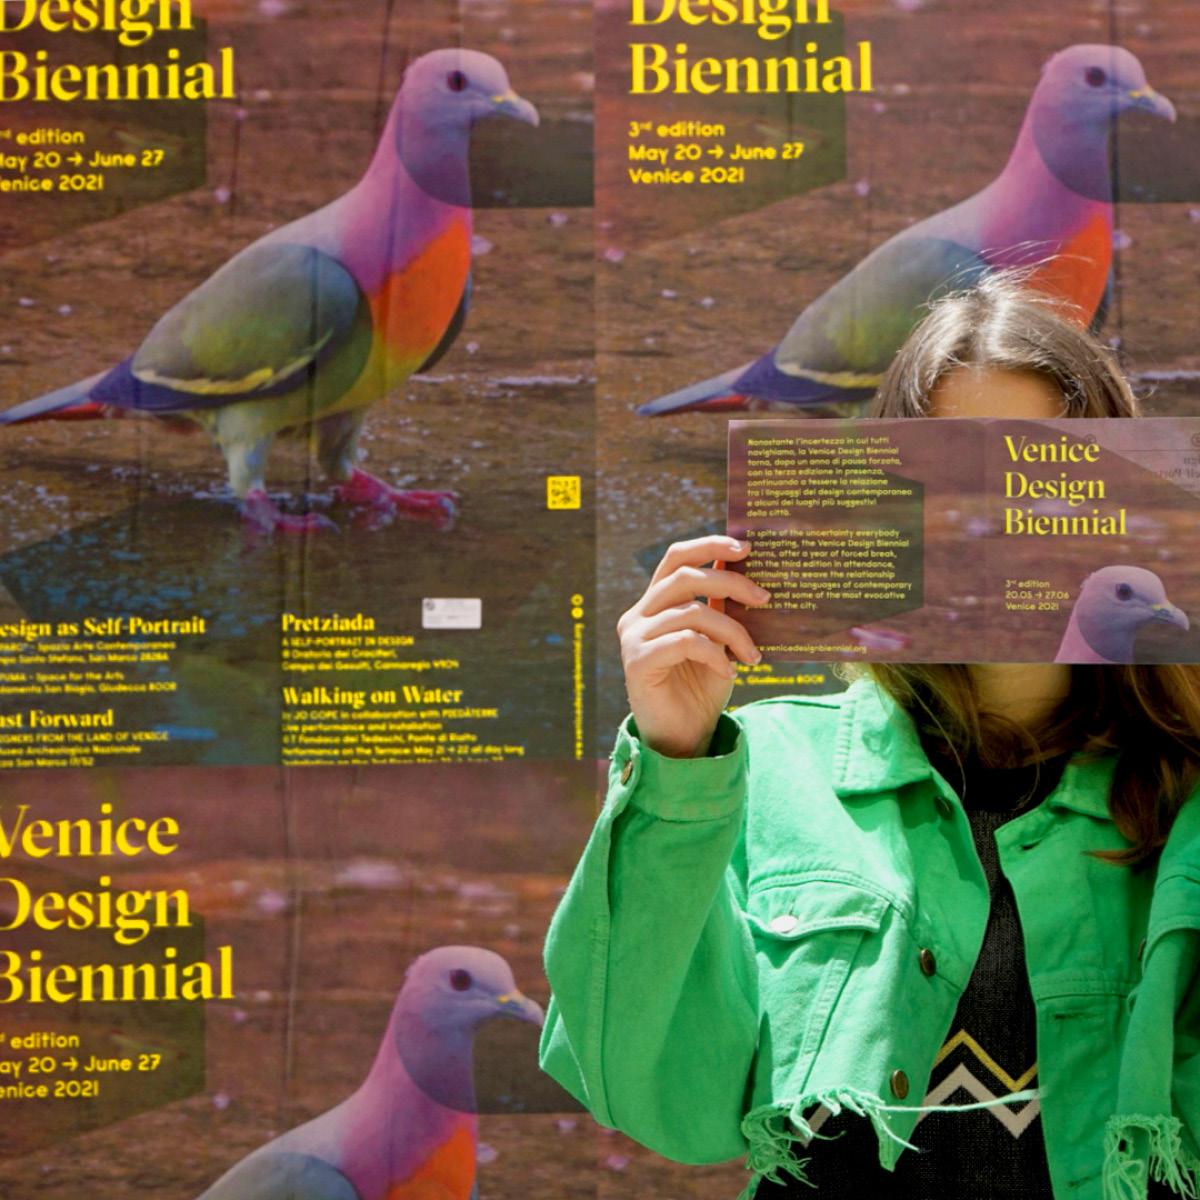 Venice-Design-Biennial-2021-003